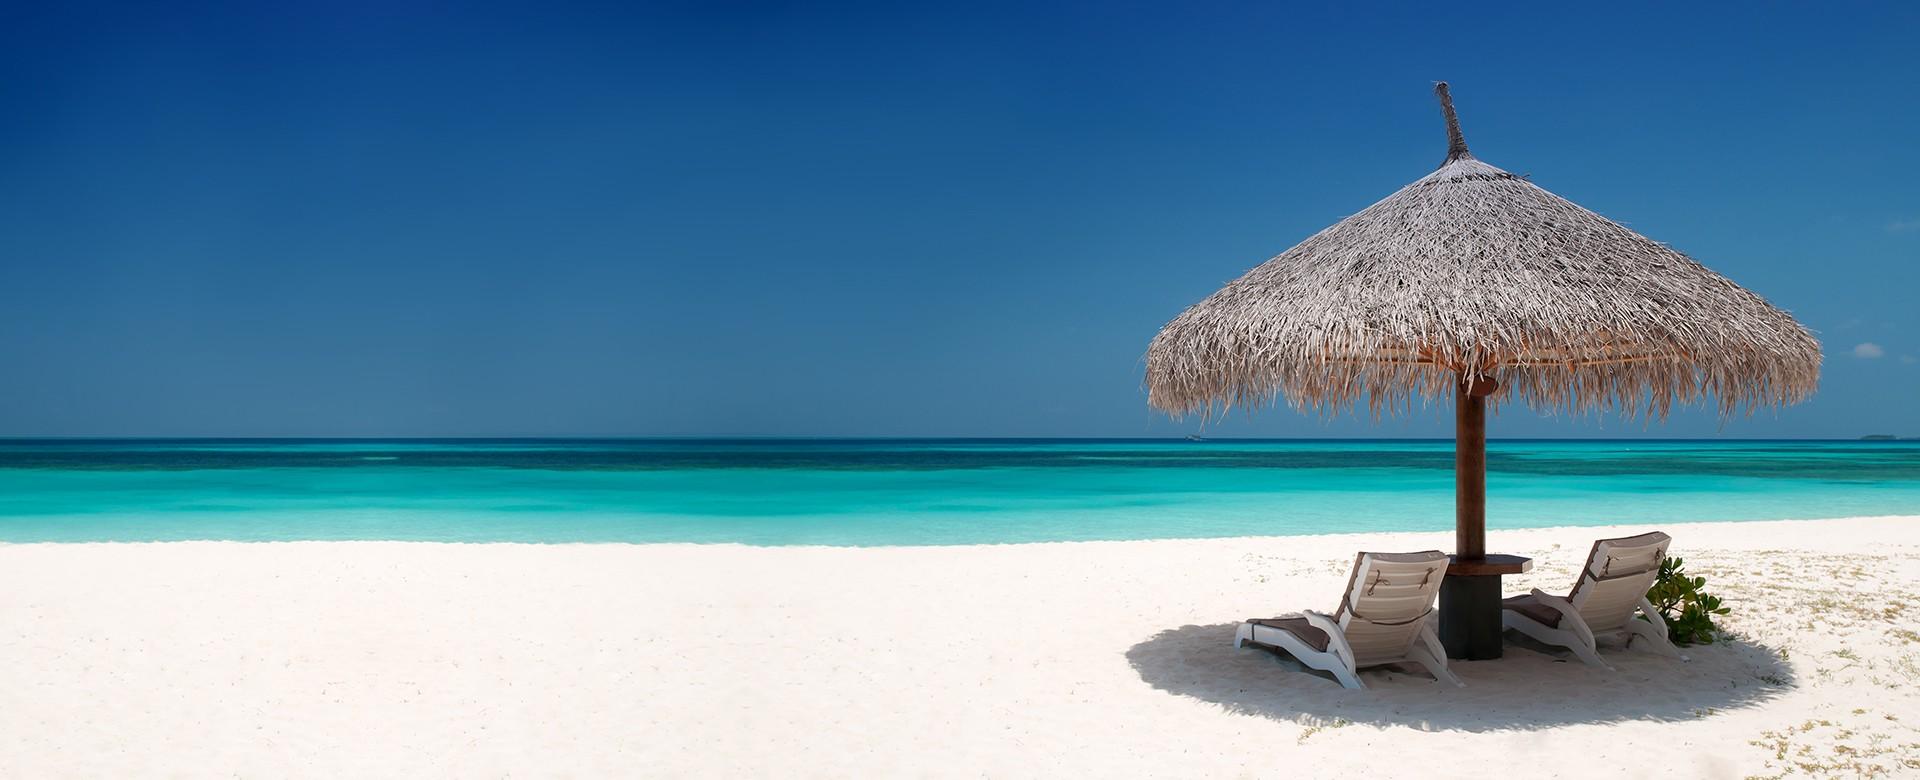 Urlaub_Sommer